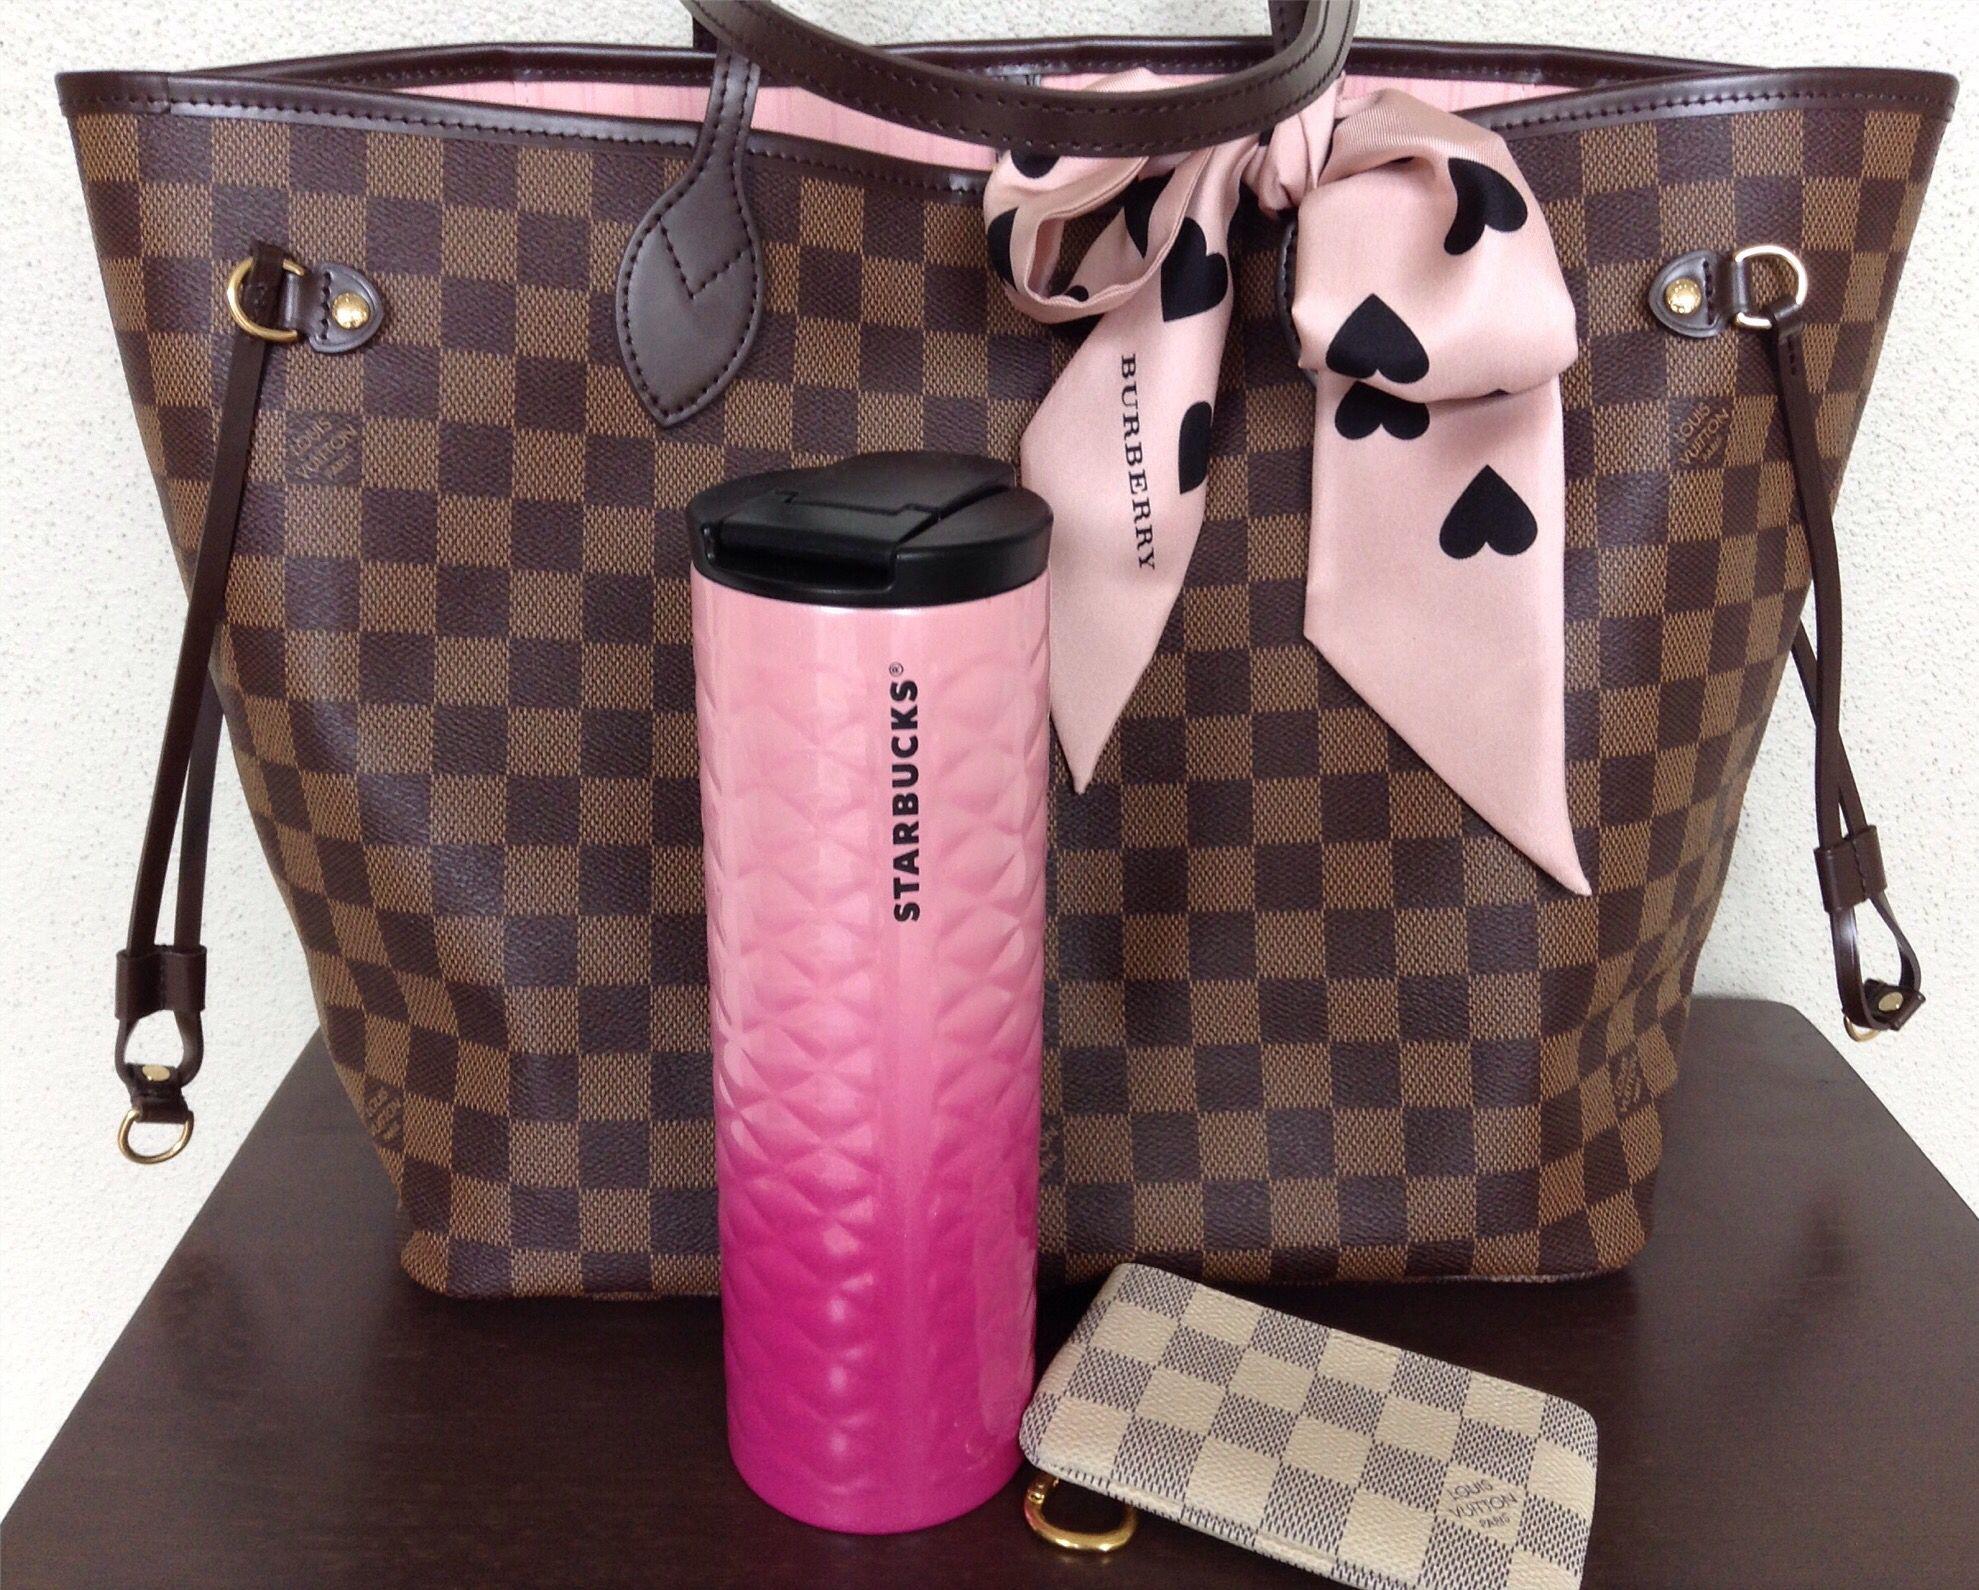 louis vuitton rose ballerine damier ebene neverfull mm pink and black heart burberry skinny. Black Bedroom Furniture Sets. Home Design Ideas